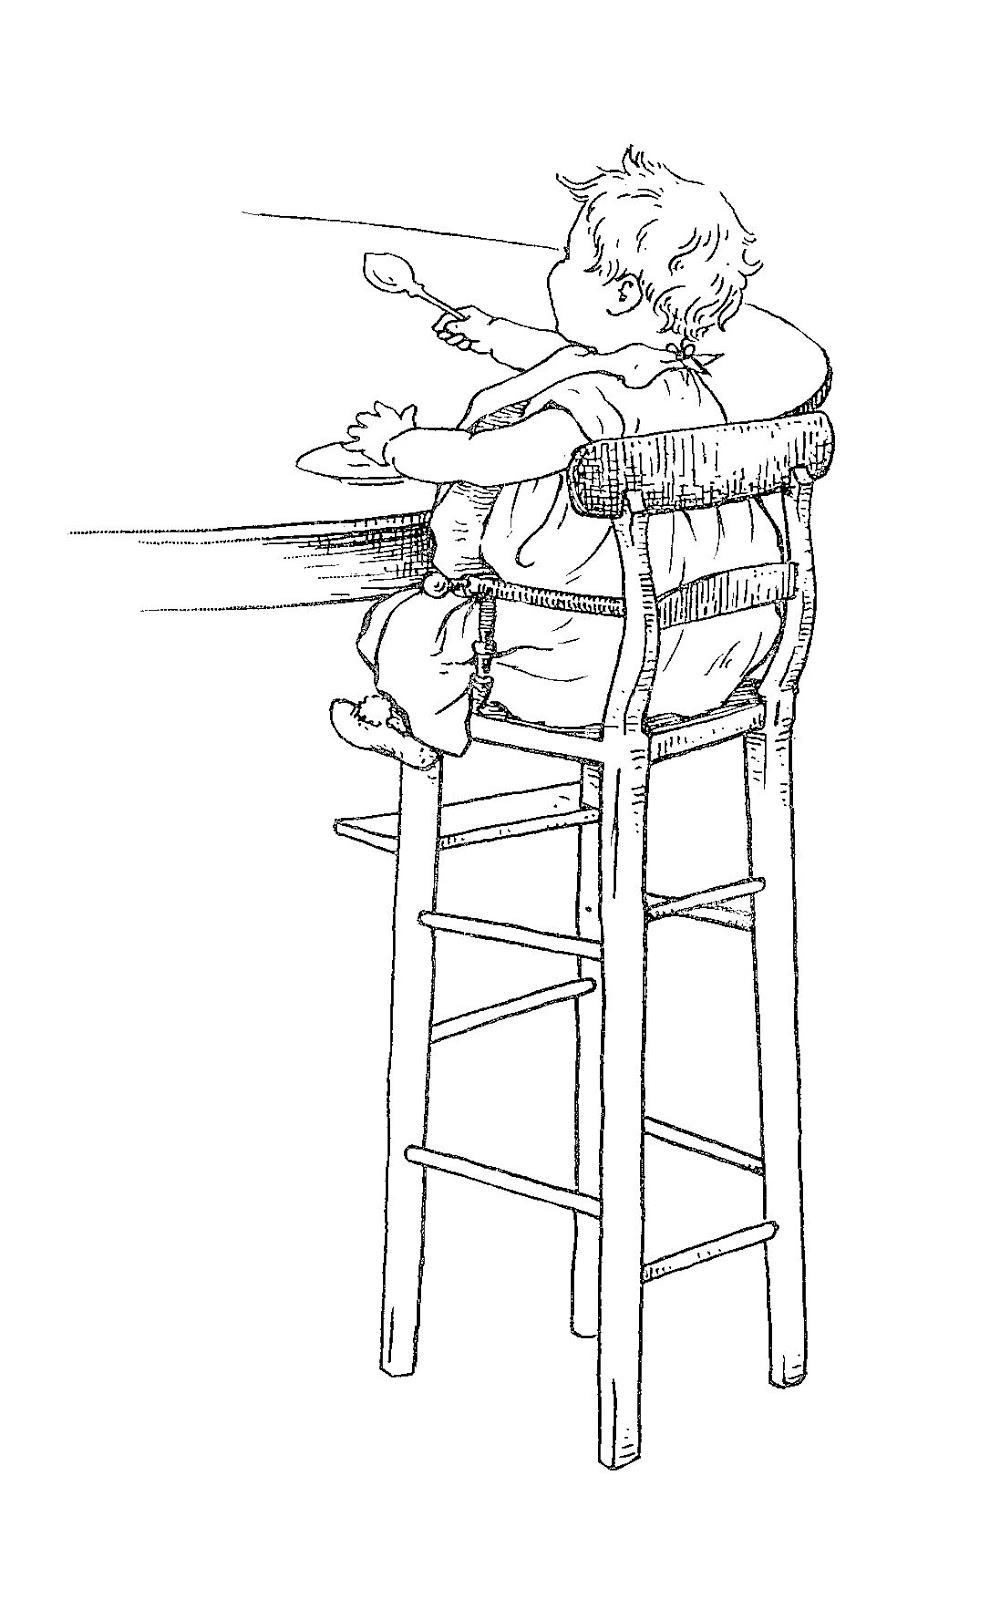 baby highchair illustration download vintage - Digital Stamp Design: Free Vintage Baby Digital Clip Art High Chair